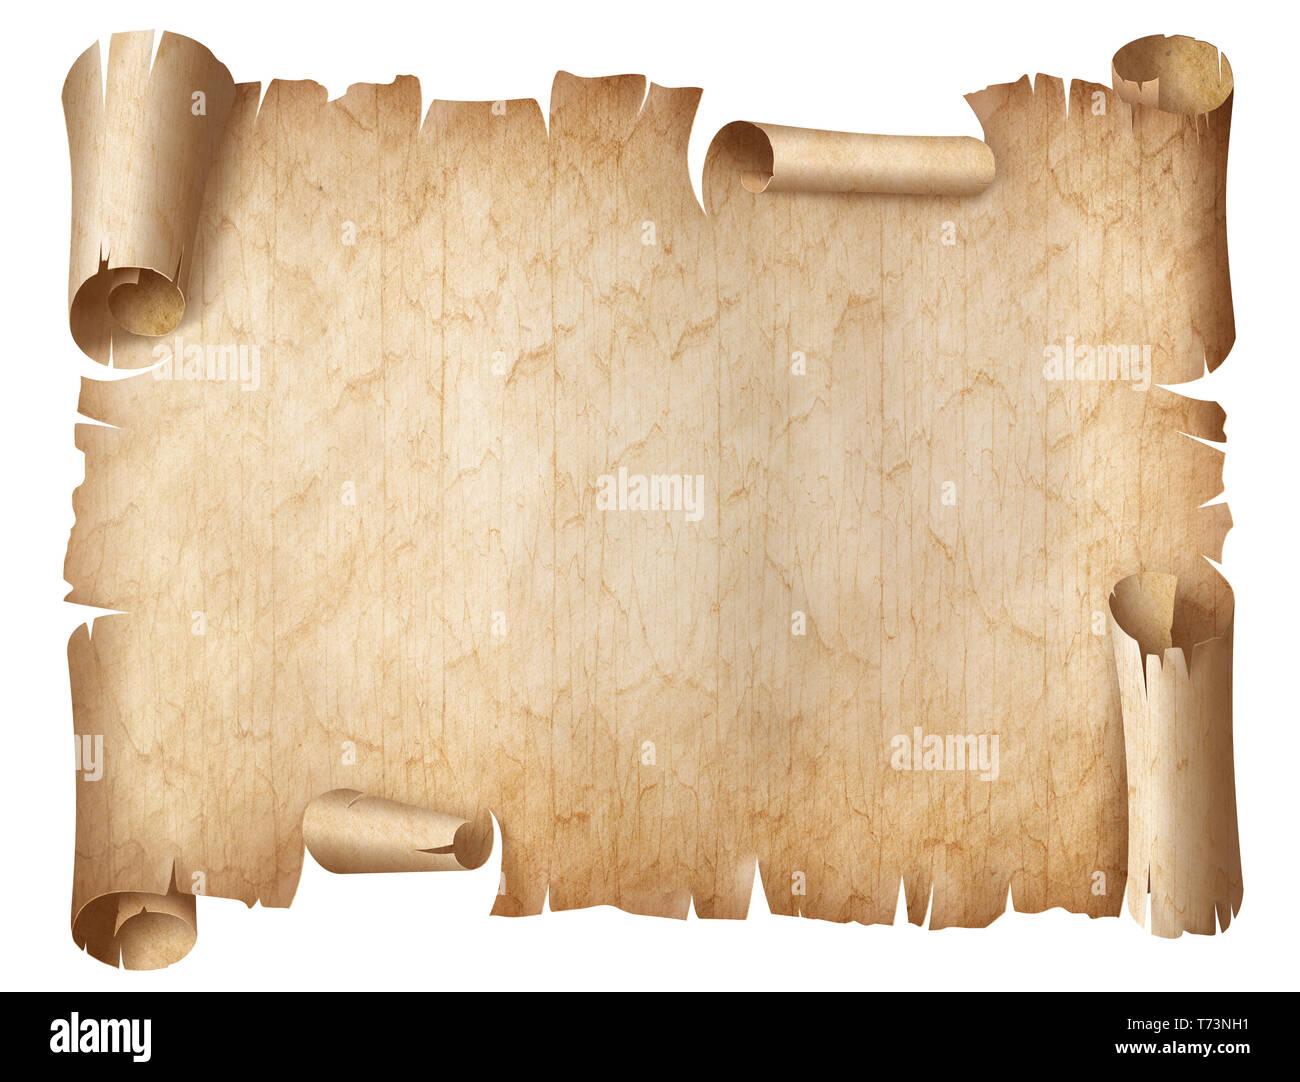 Ancien Parchemin Use Ou Ancien Document Isole Photo Stock Alamy